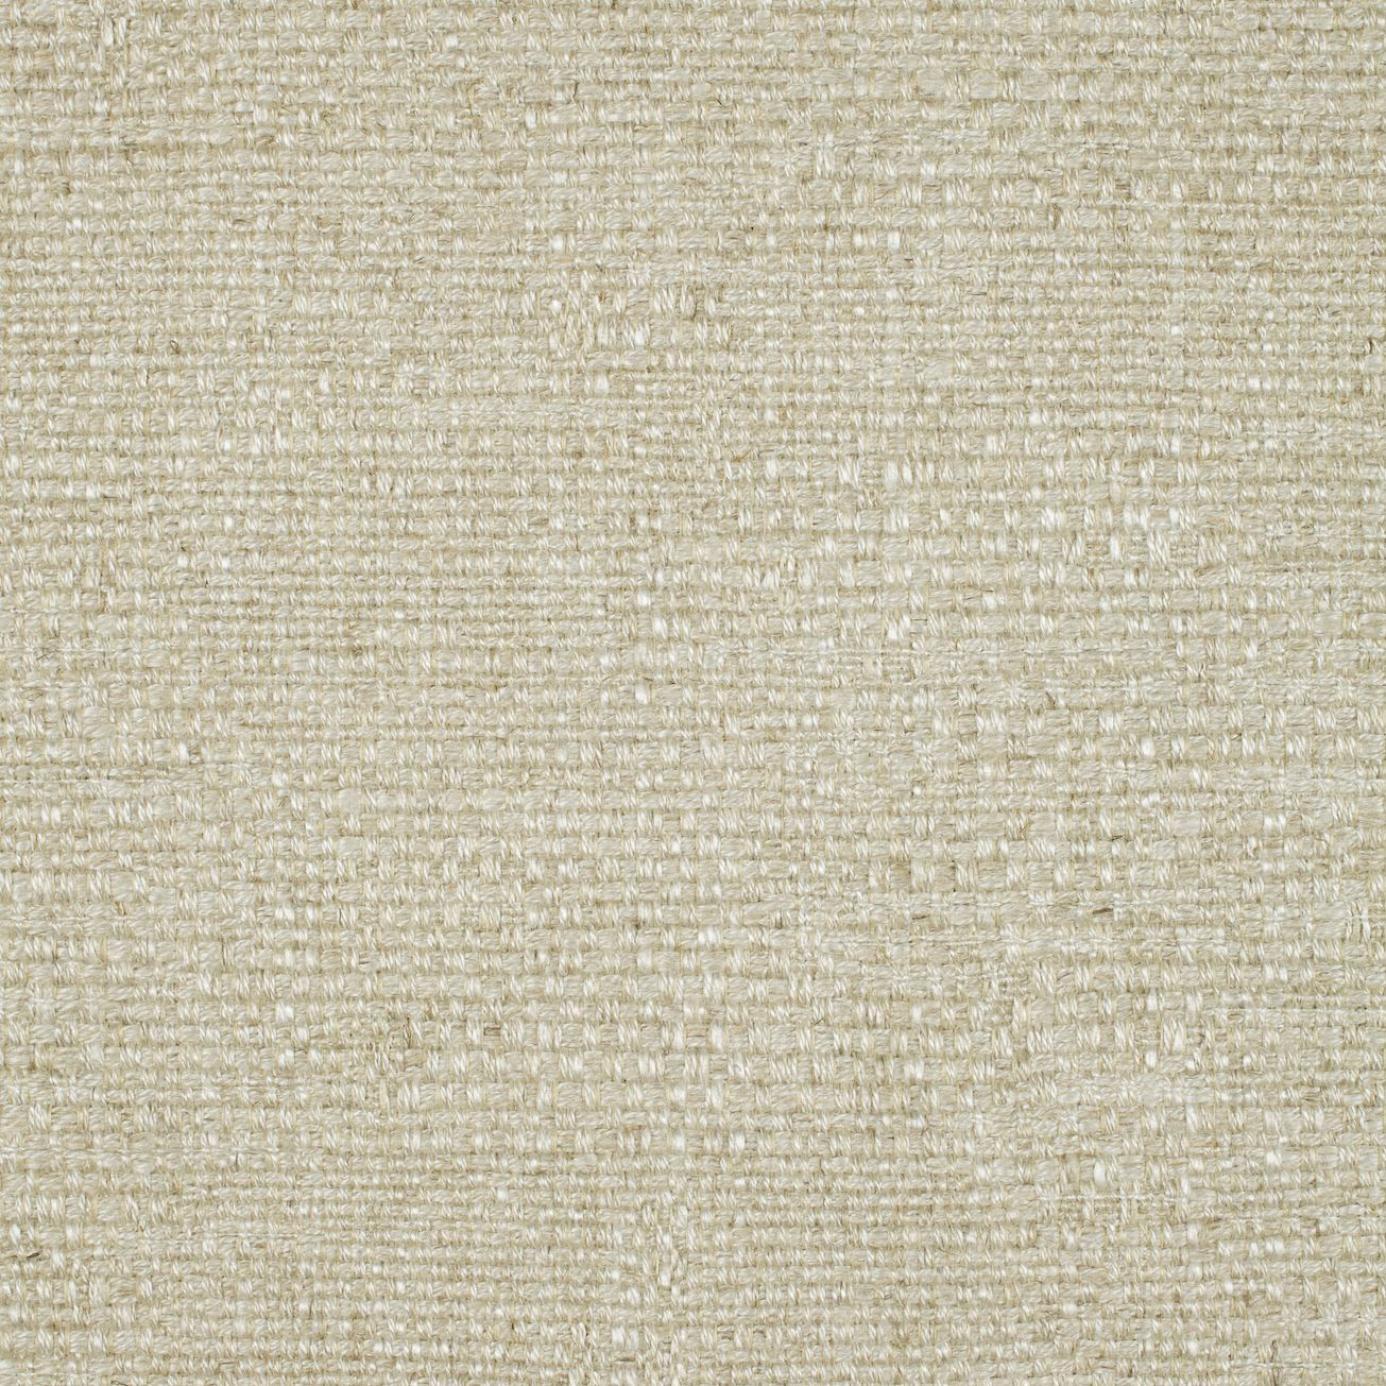 Canvas Fabric - Natural (231015) - Sanderson Orlando Weaves Fabrics ...